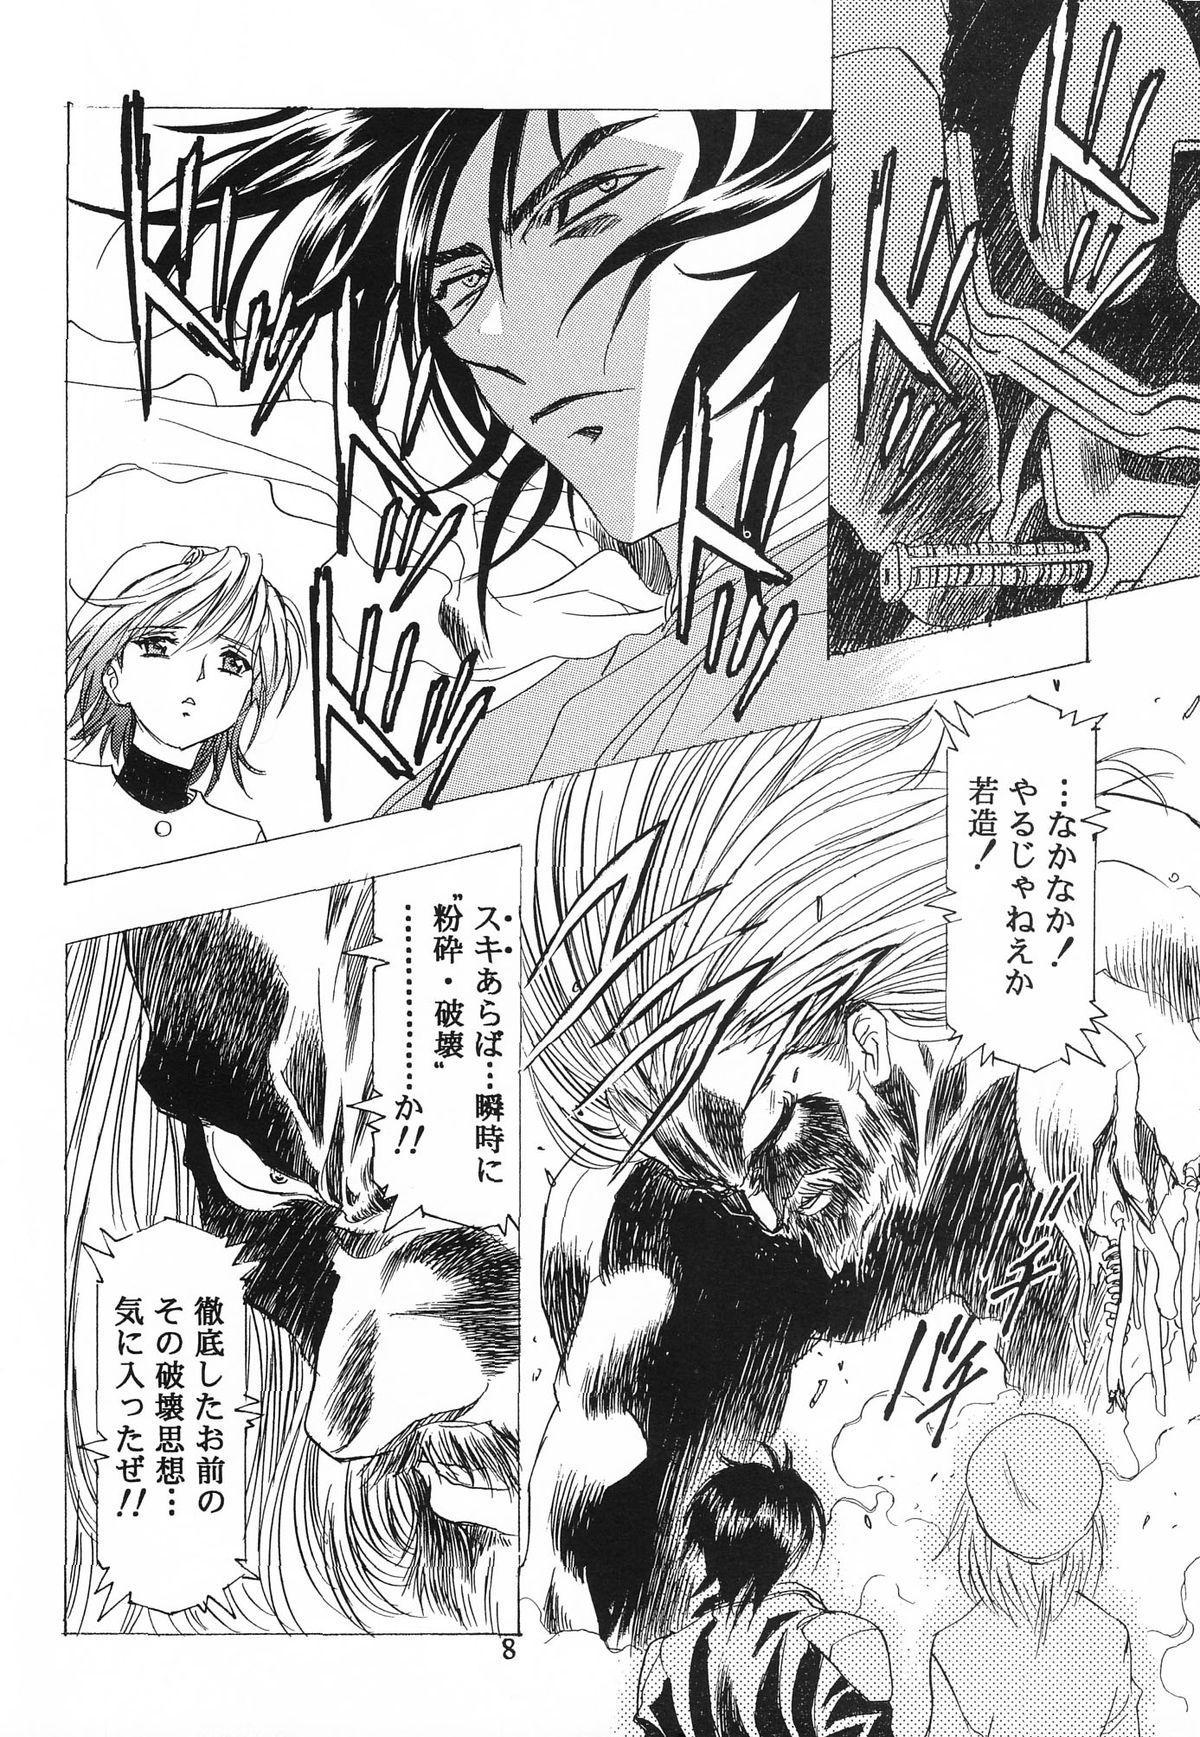 Henrei-kai '98 Natsu SPECIAL 9